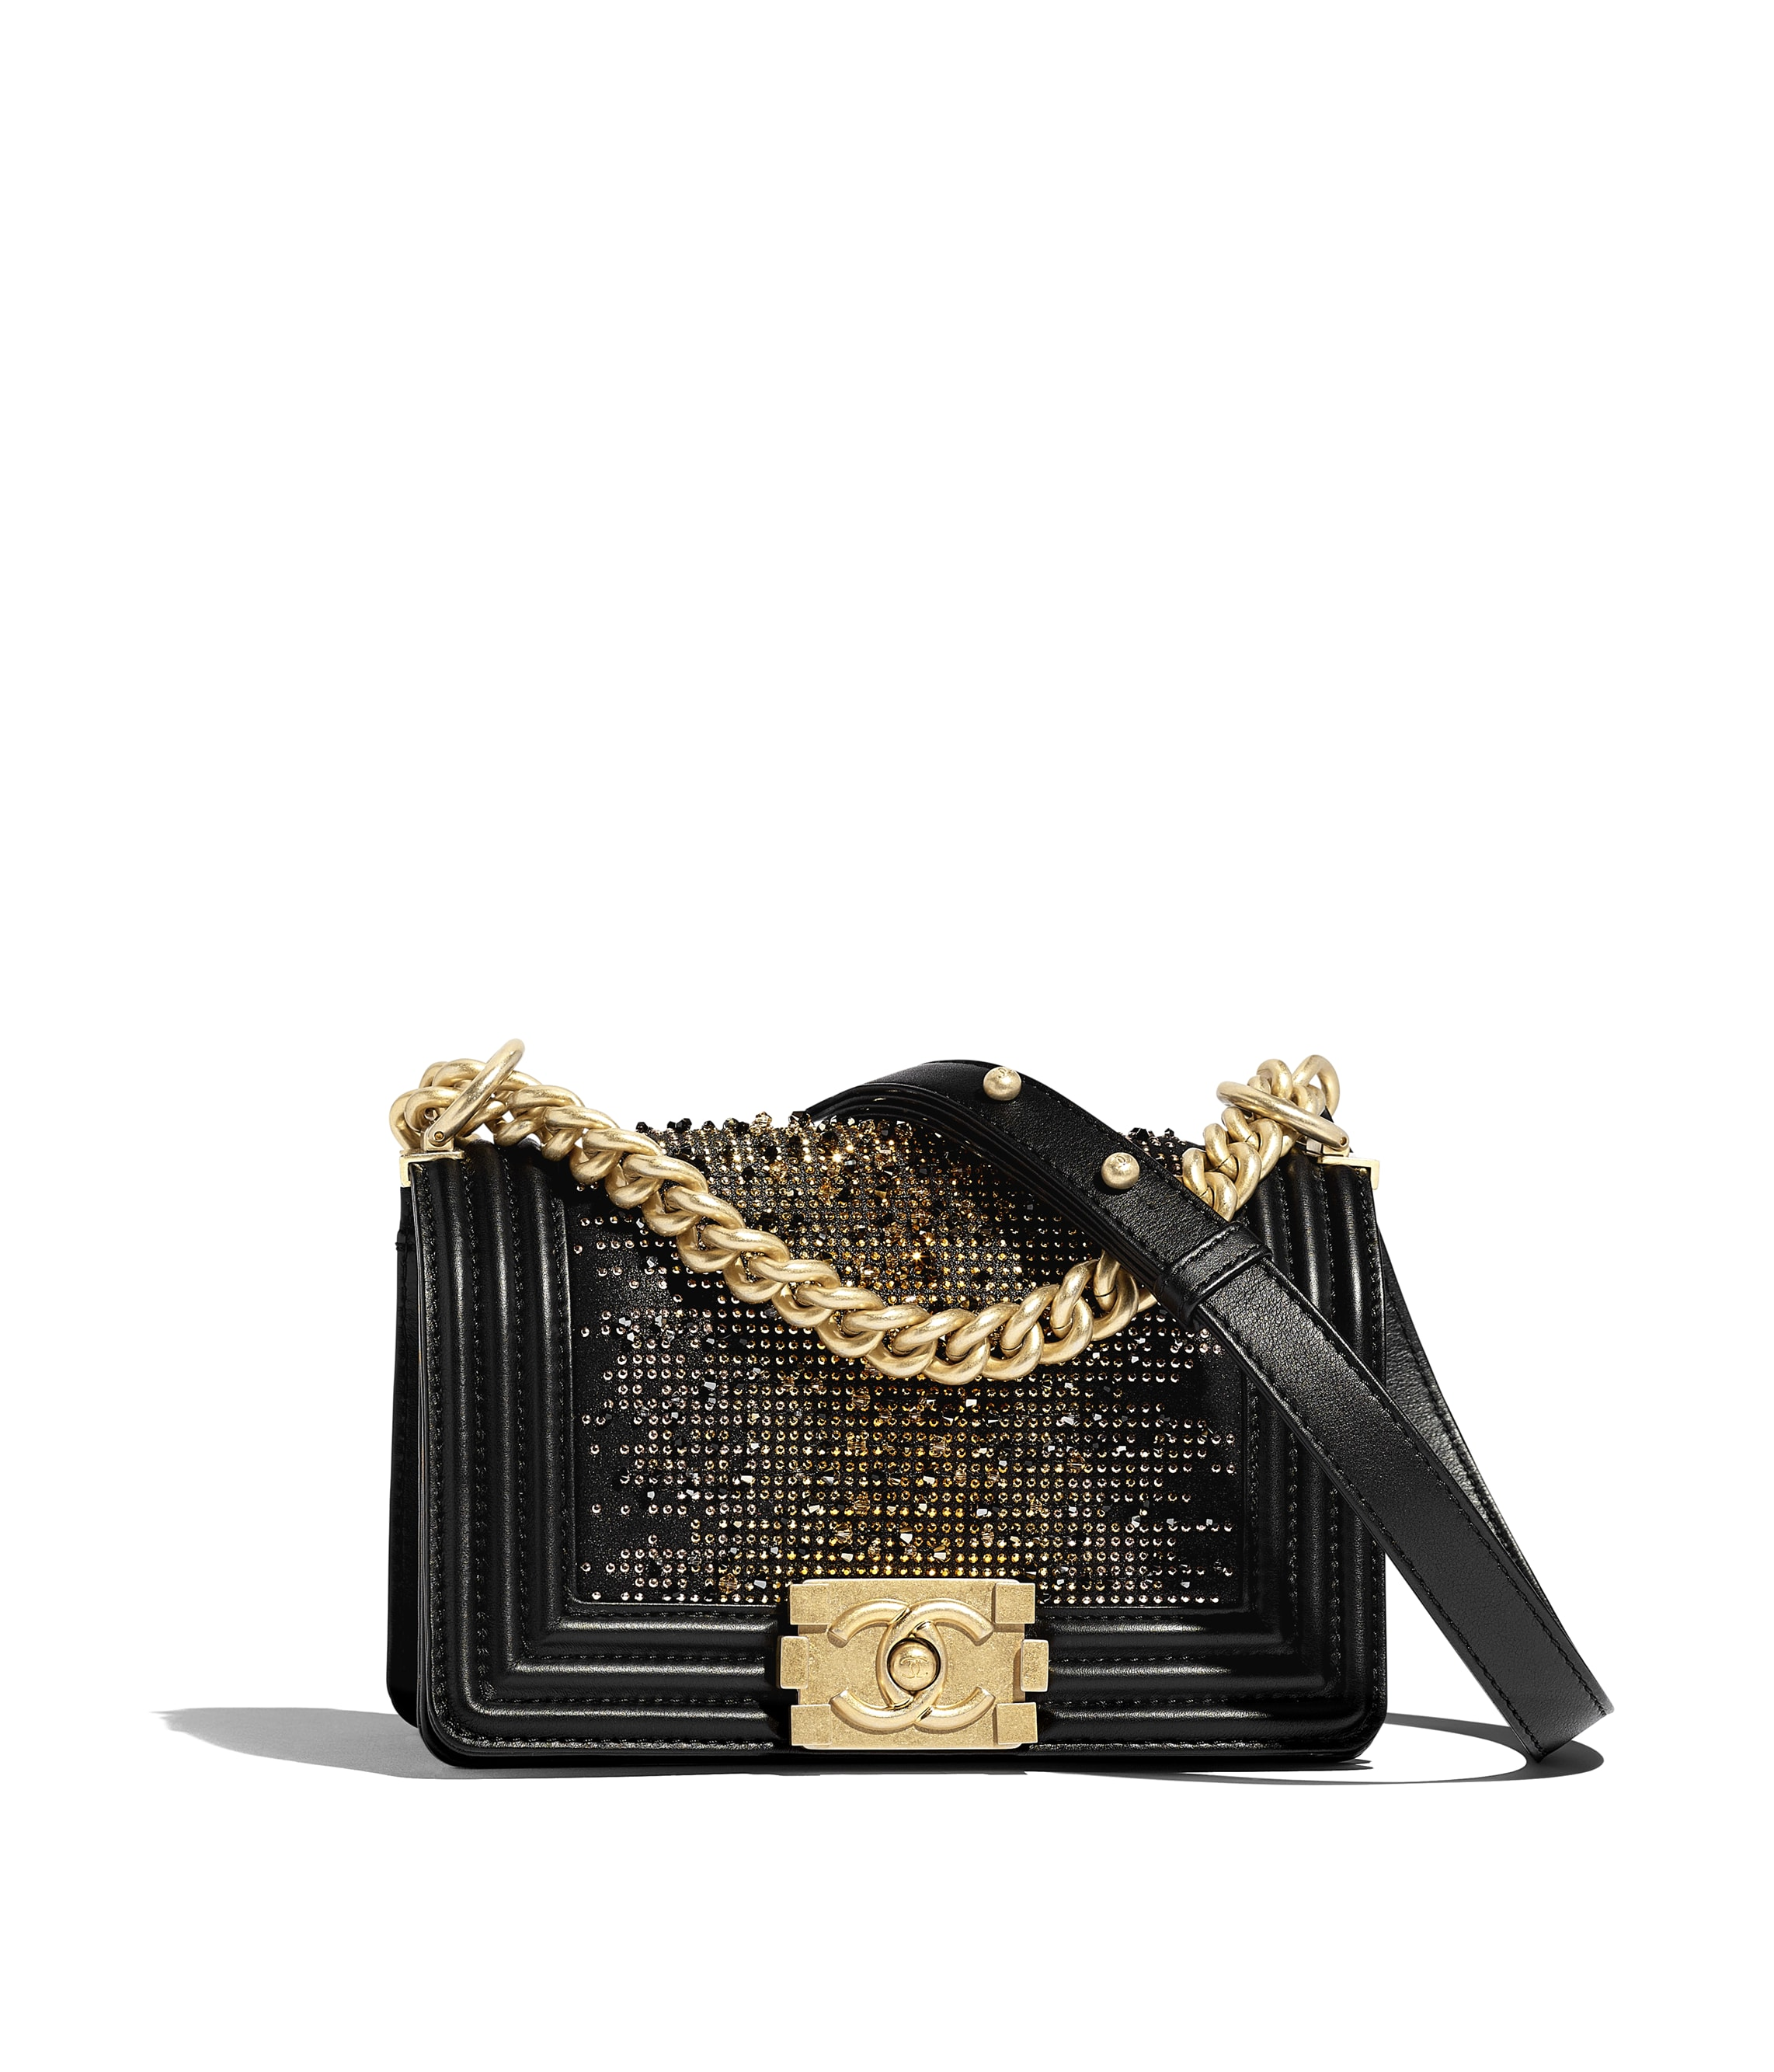 07275bab4d21e9 BOY CHANEL - Handbags - CHANEL